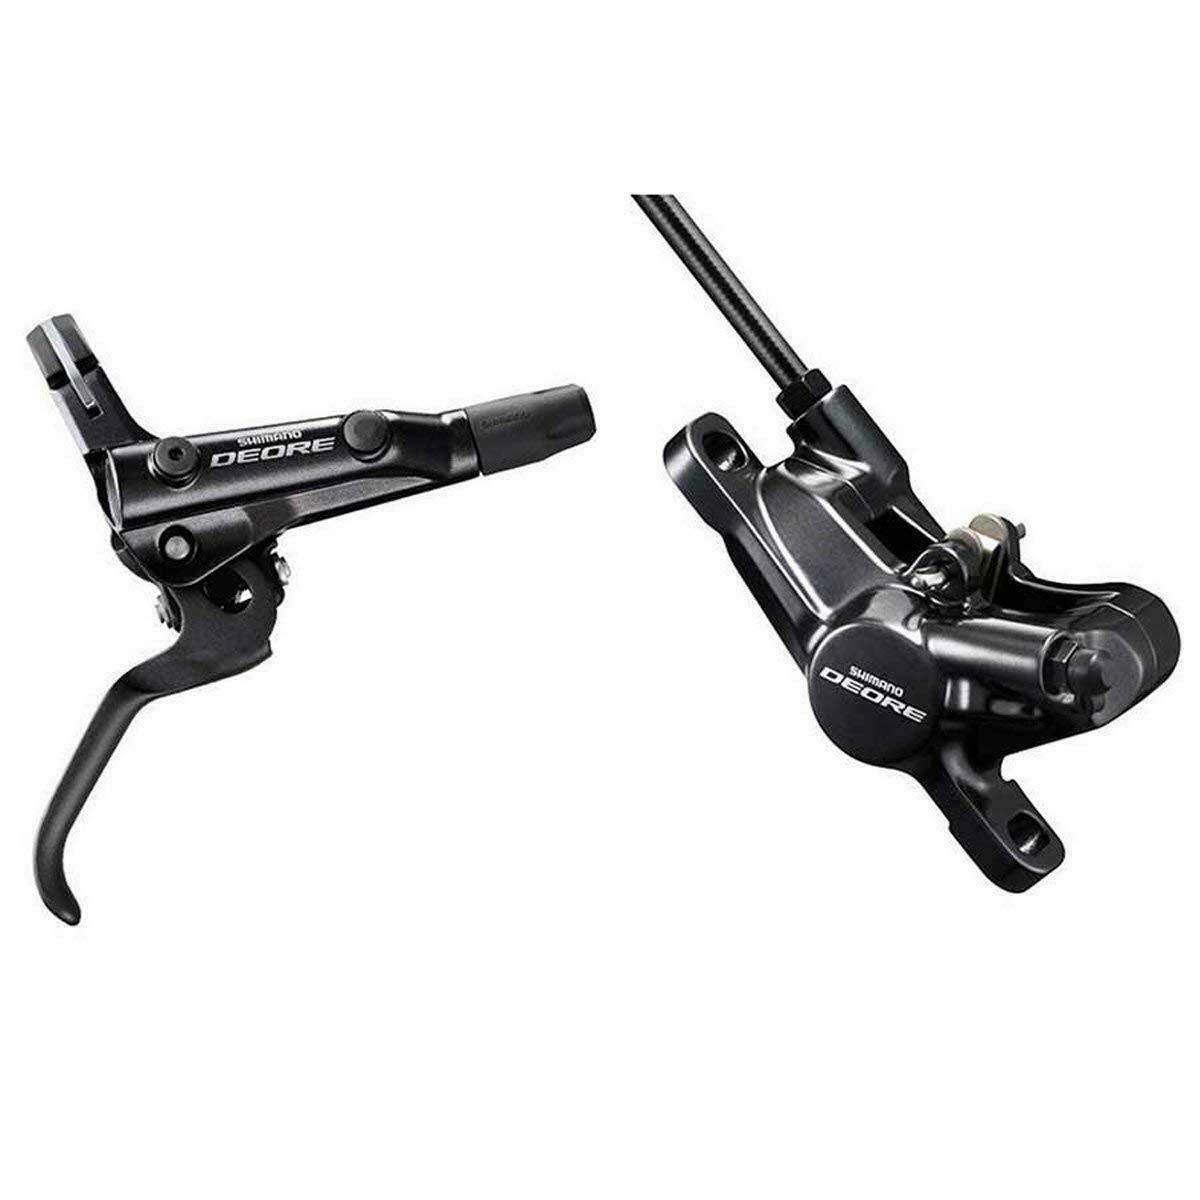 JKSPORTS Shimano Hydraulic Disc Brake Set M6000 M7000 XT M8000 Brakes Set,MTB Hydraulic disc Brakes Set (M6000 a Pair Hydraulic Disc Brake Set) by JKSPORTS